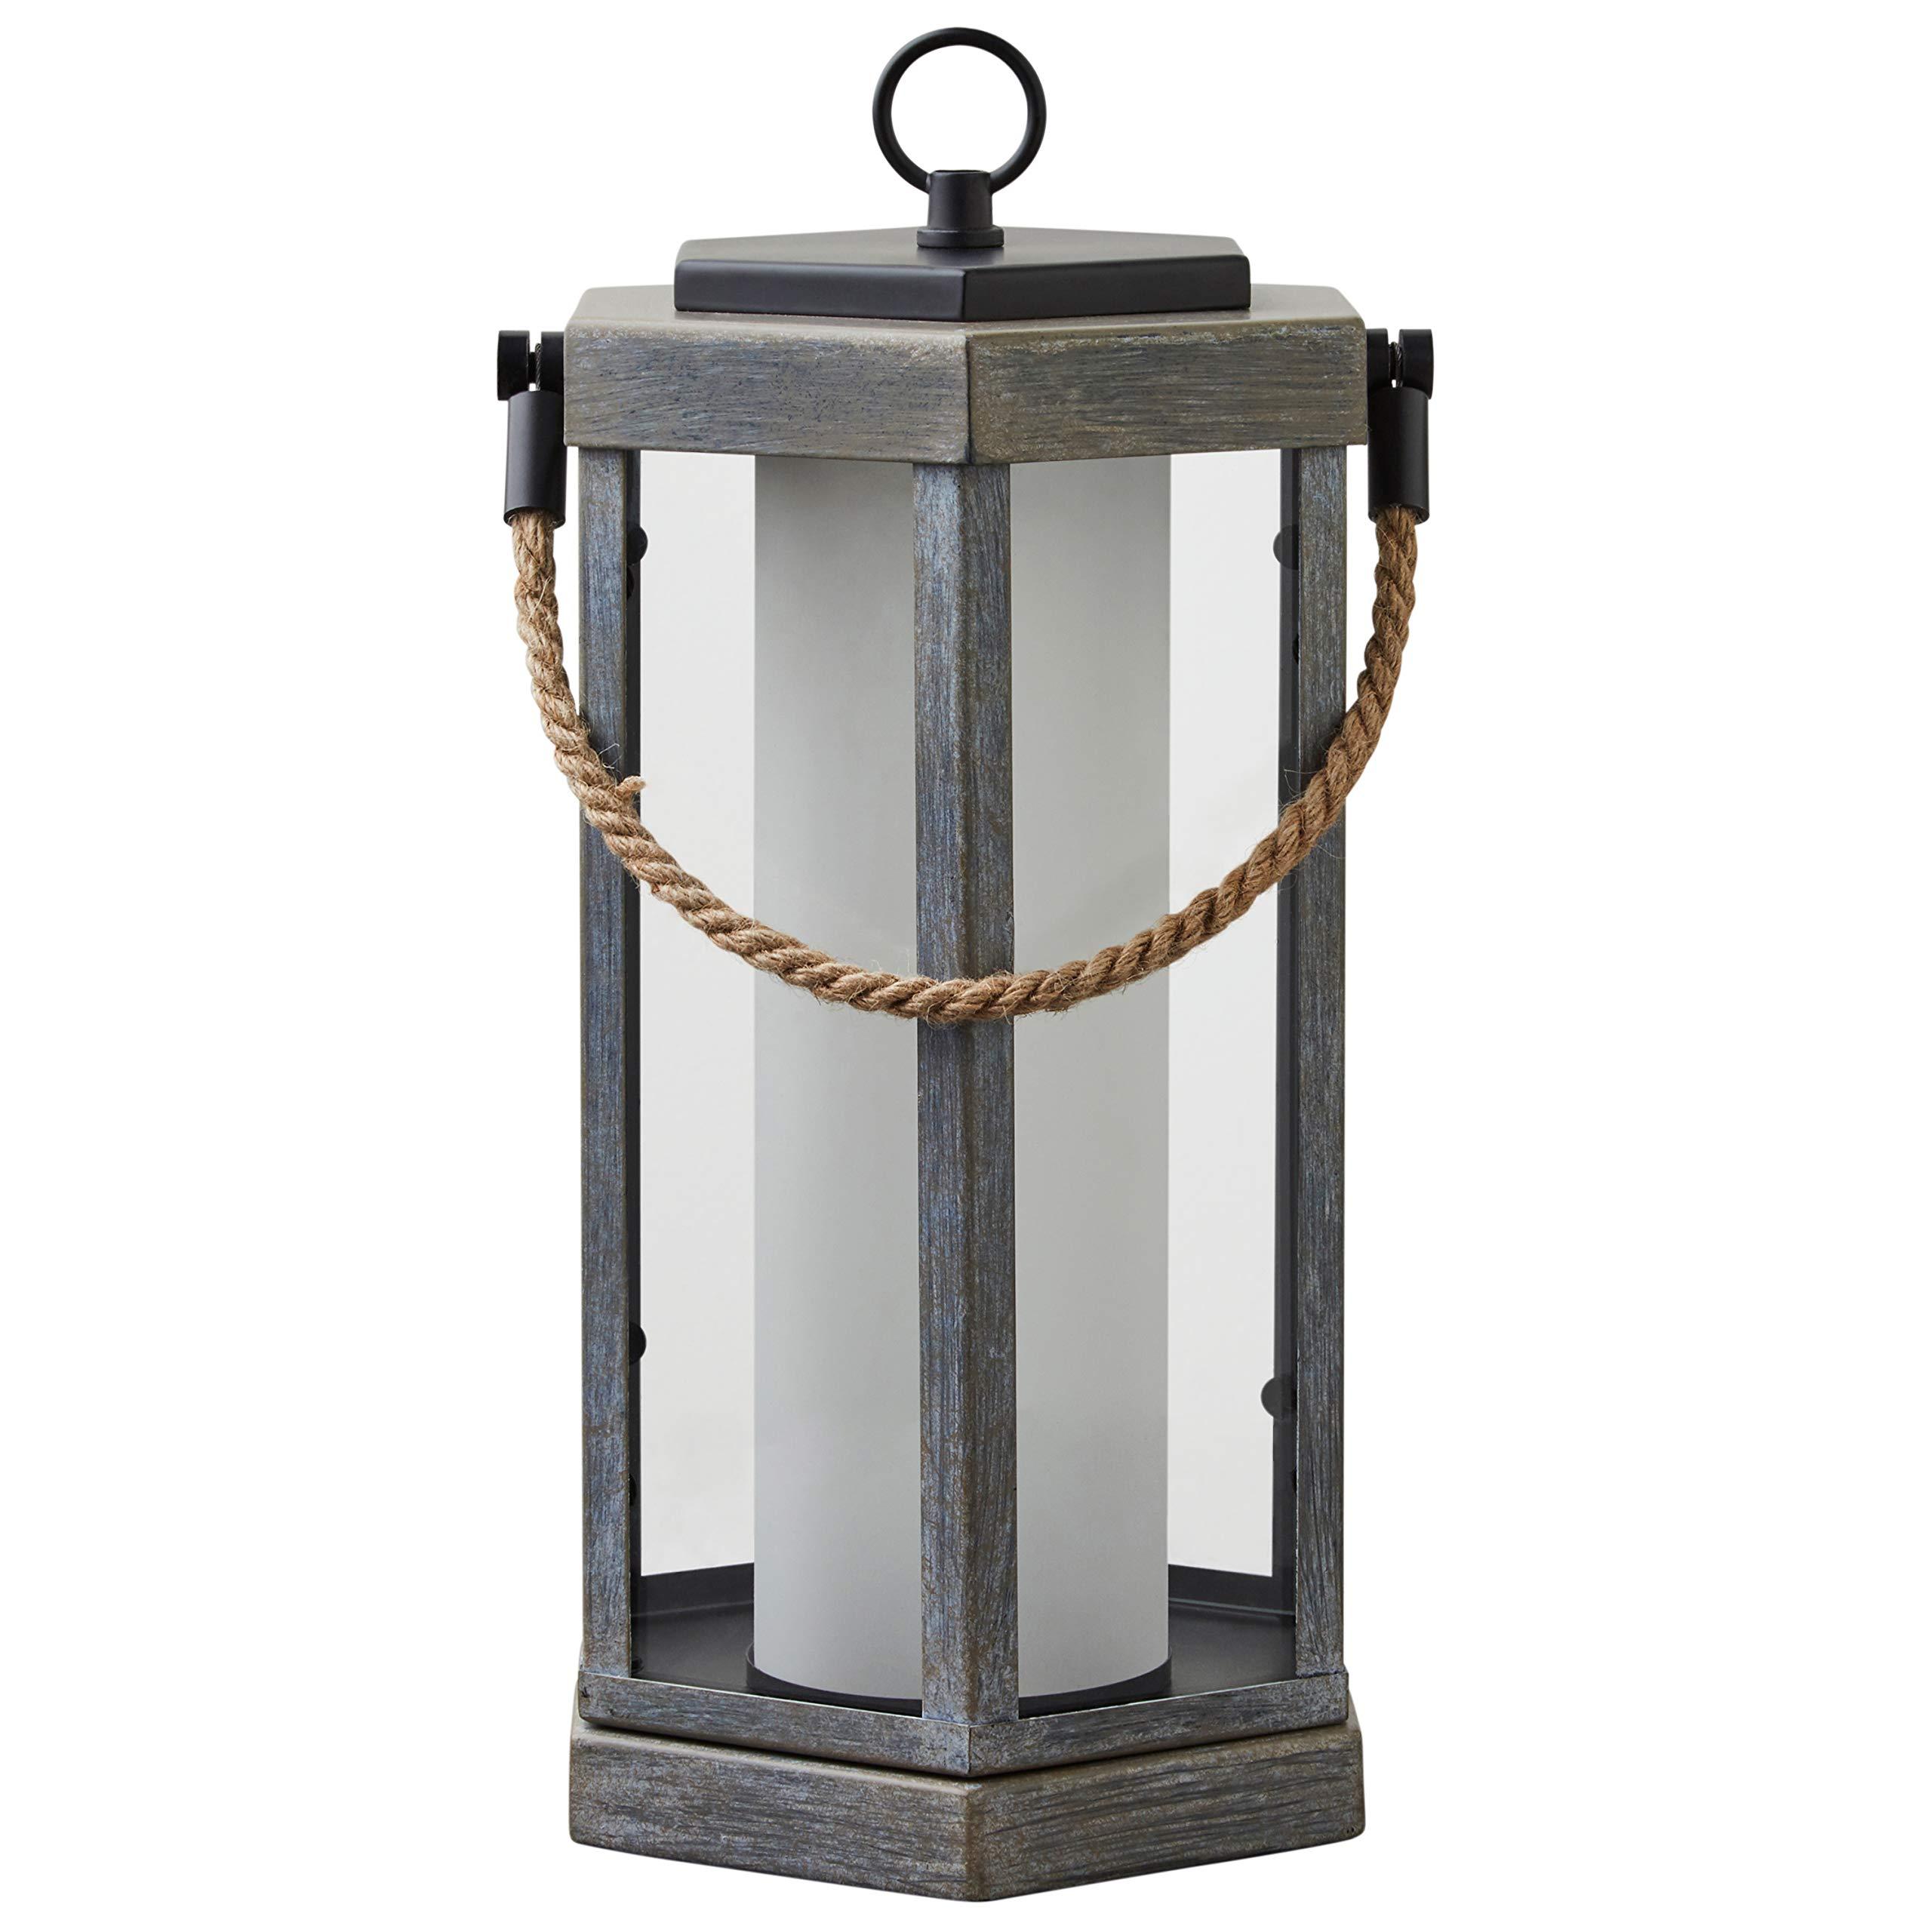 "Amazon Brand – Stone & Beam Rustic Faux Wood Finish Lantern with Bulb, 14""H"